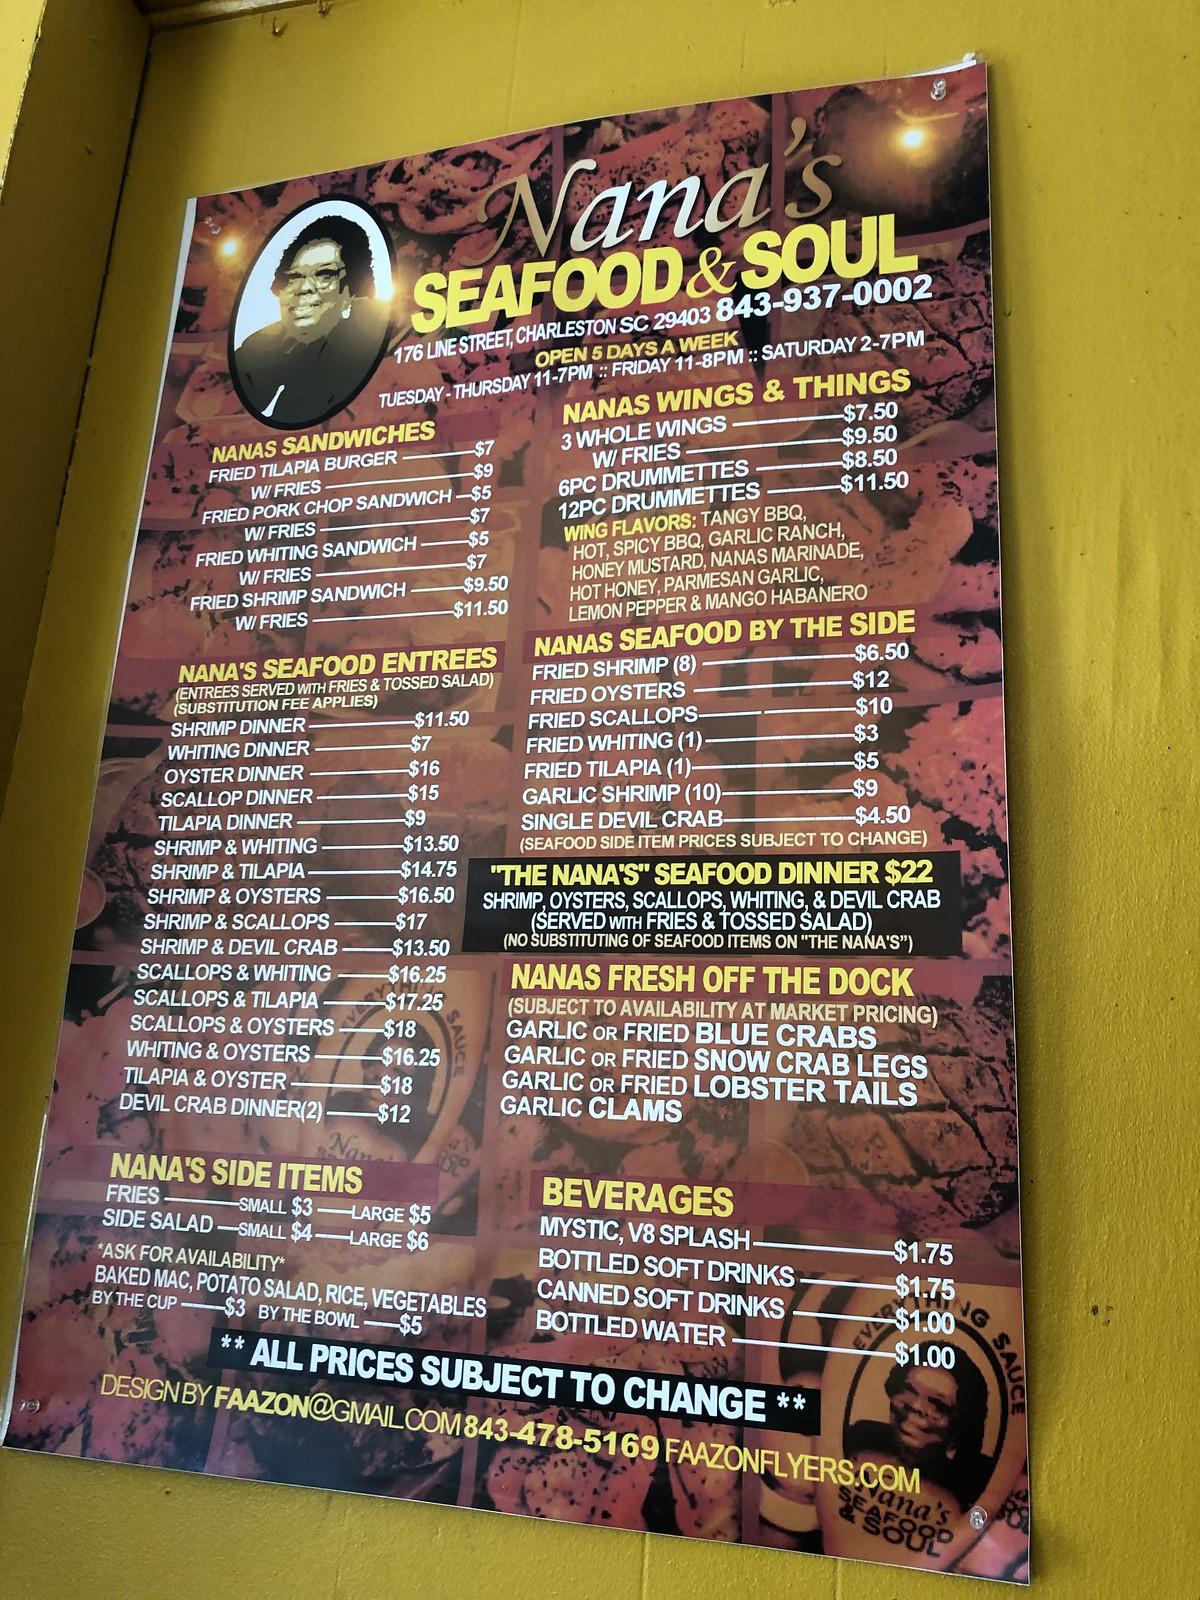 Nanas seafood & soul